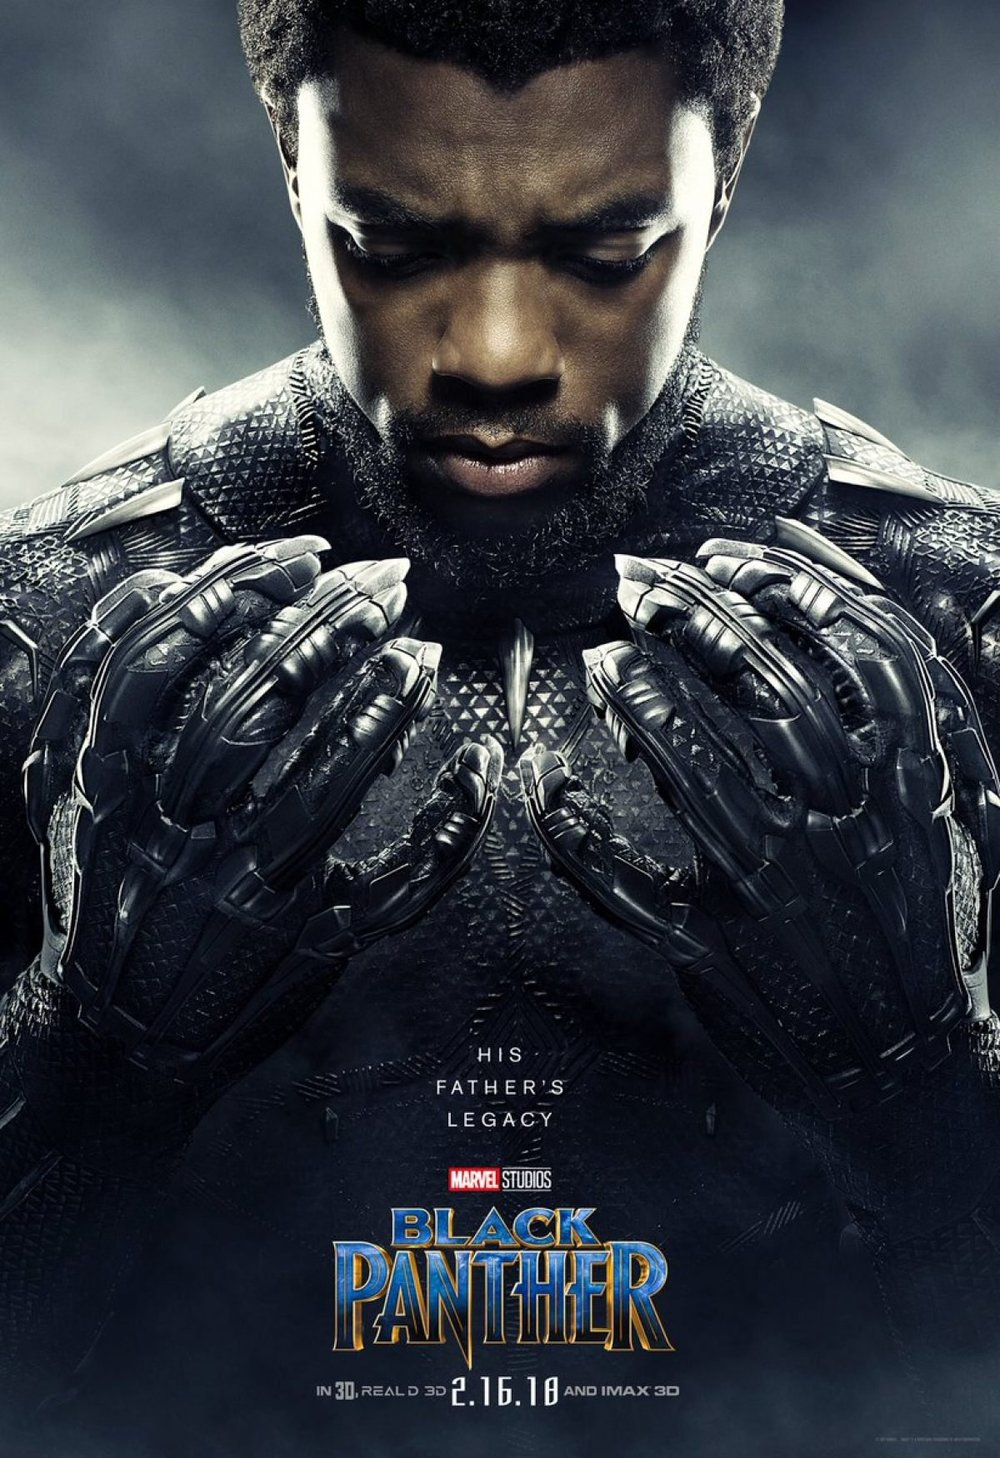 Black-Panther-Poster-1_1200_1750_81_s.jpeg